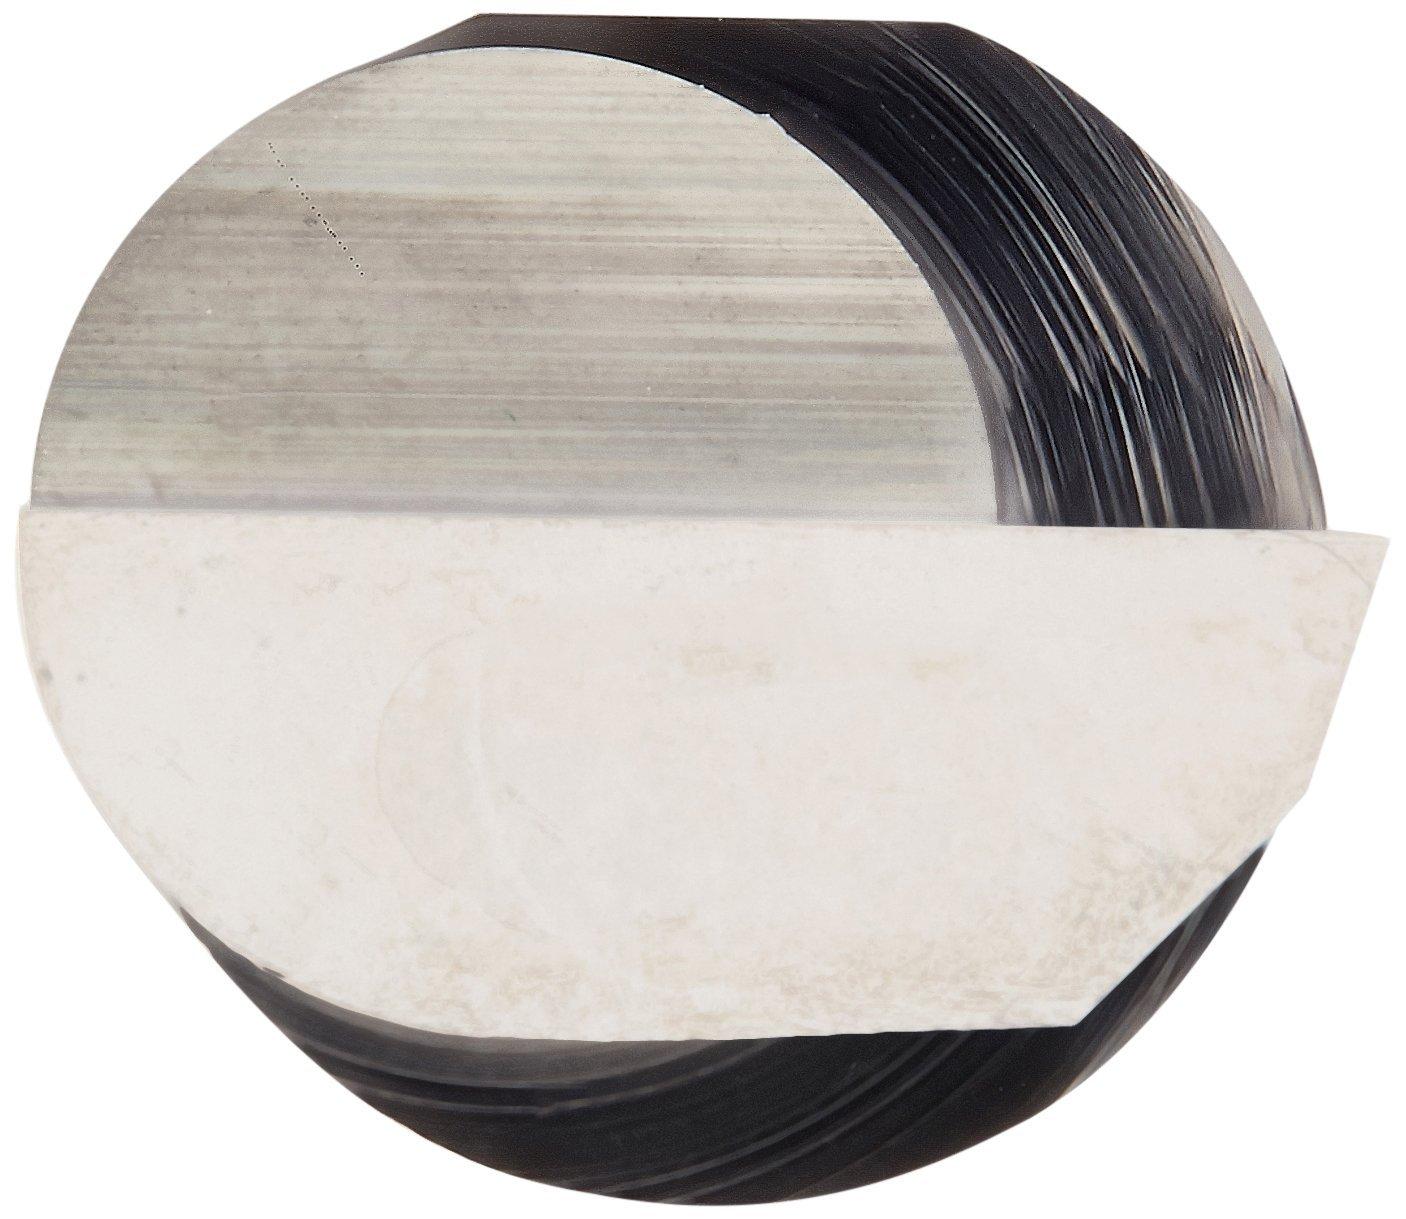 Right Hand Boring Tool 5//16 Shank Diameter 2-1//2 Overall Length Solid Carbide Tool Micro 100 1.350 Maximum Bore Depth 0.290 Minimum Bore Diameter 0.073 Projection No Cutting Radius BB-2901350S